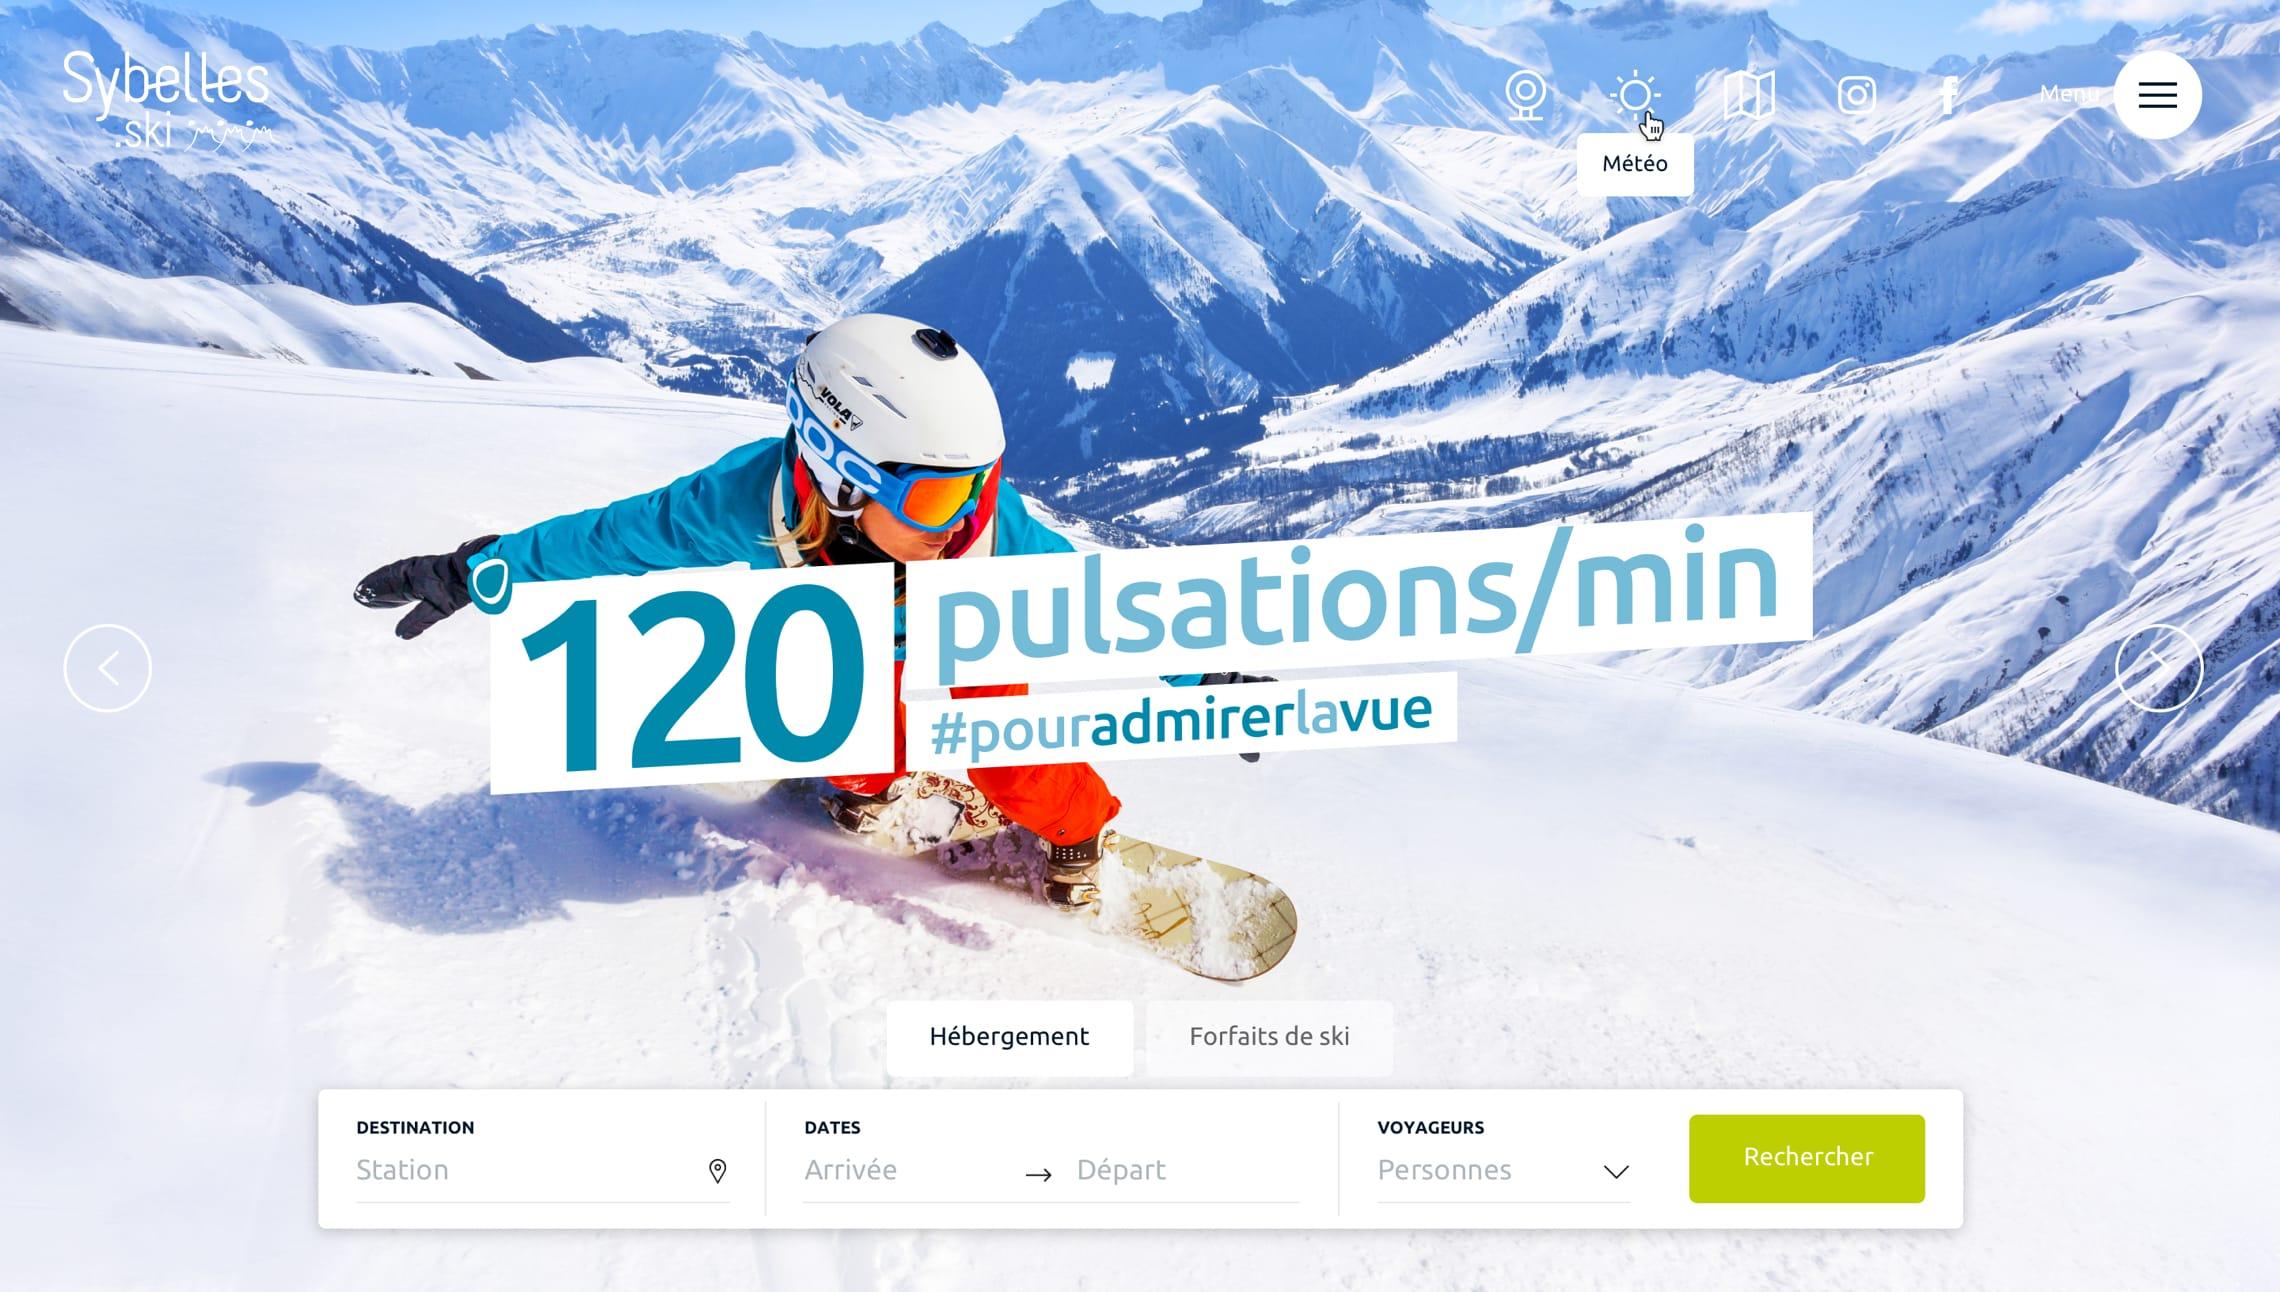 Sybelles.ski